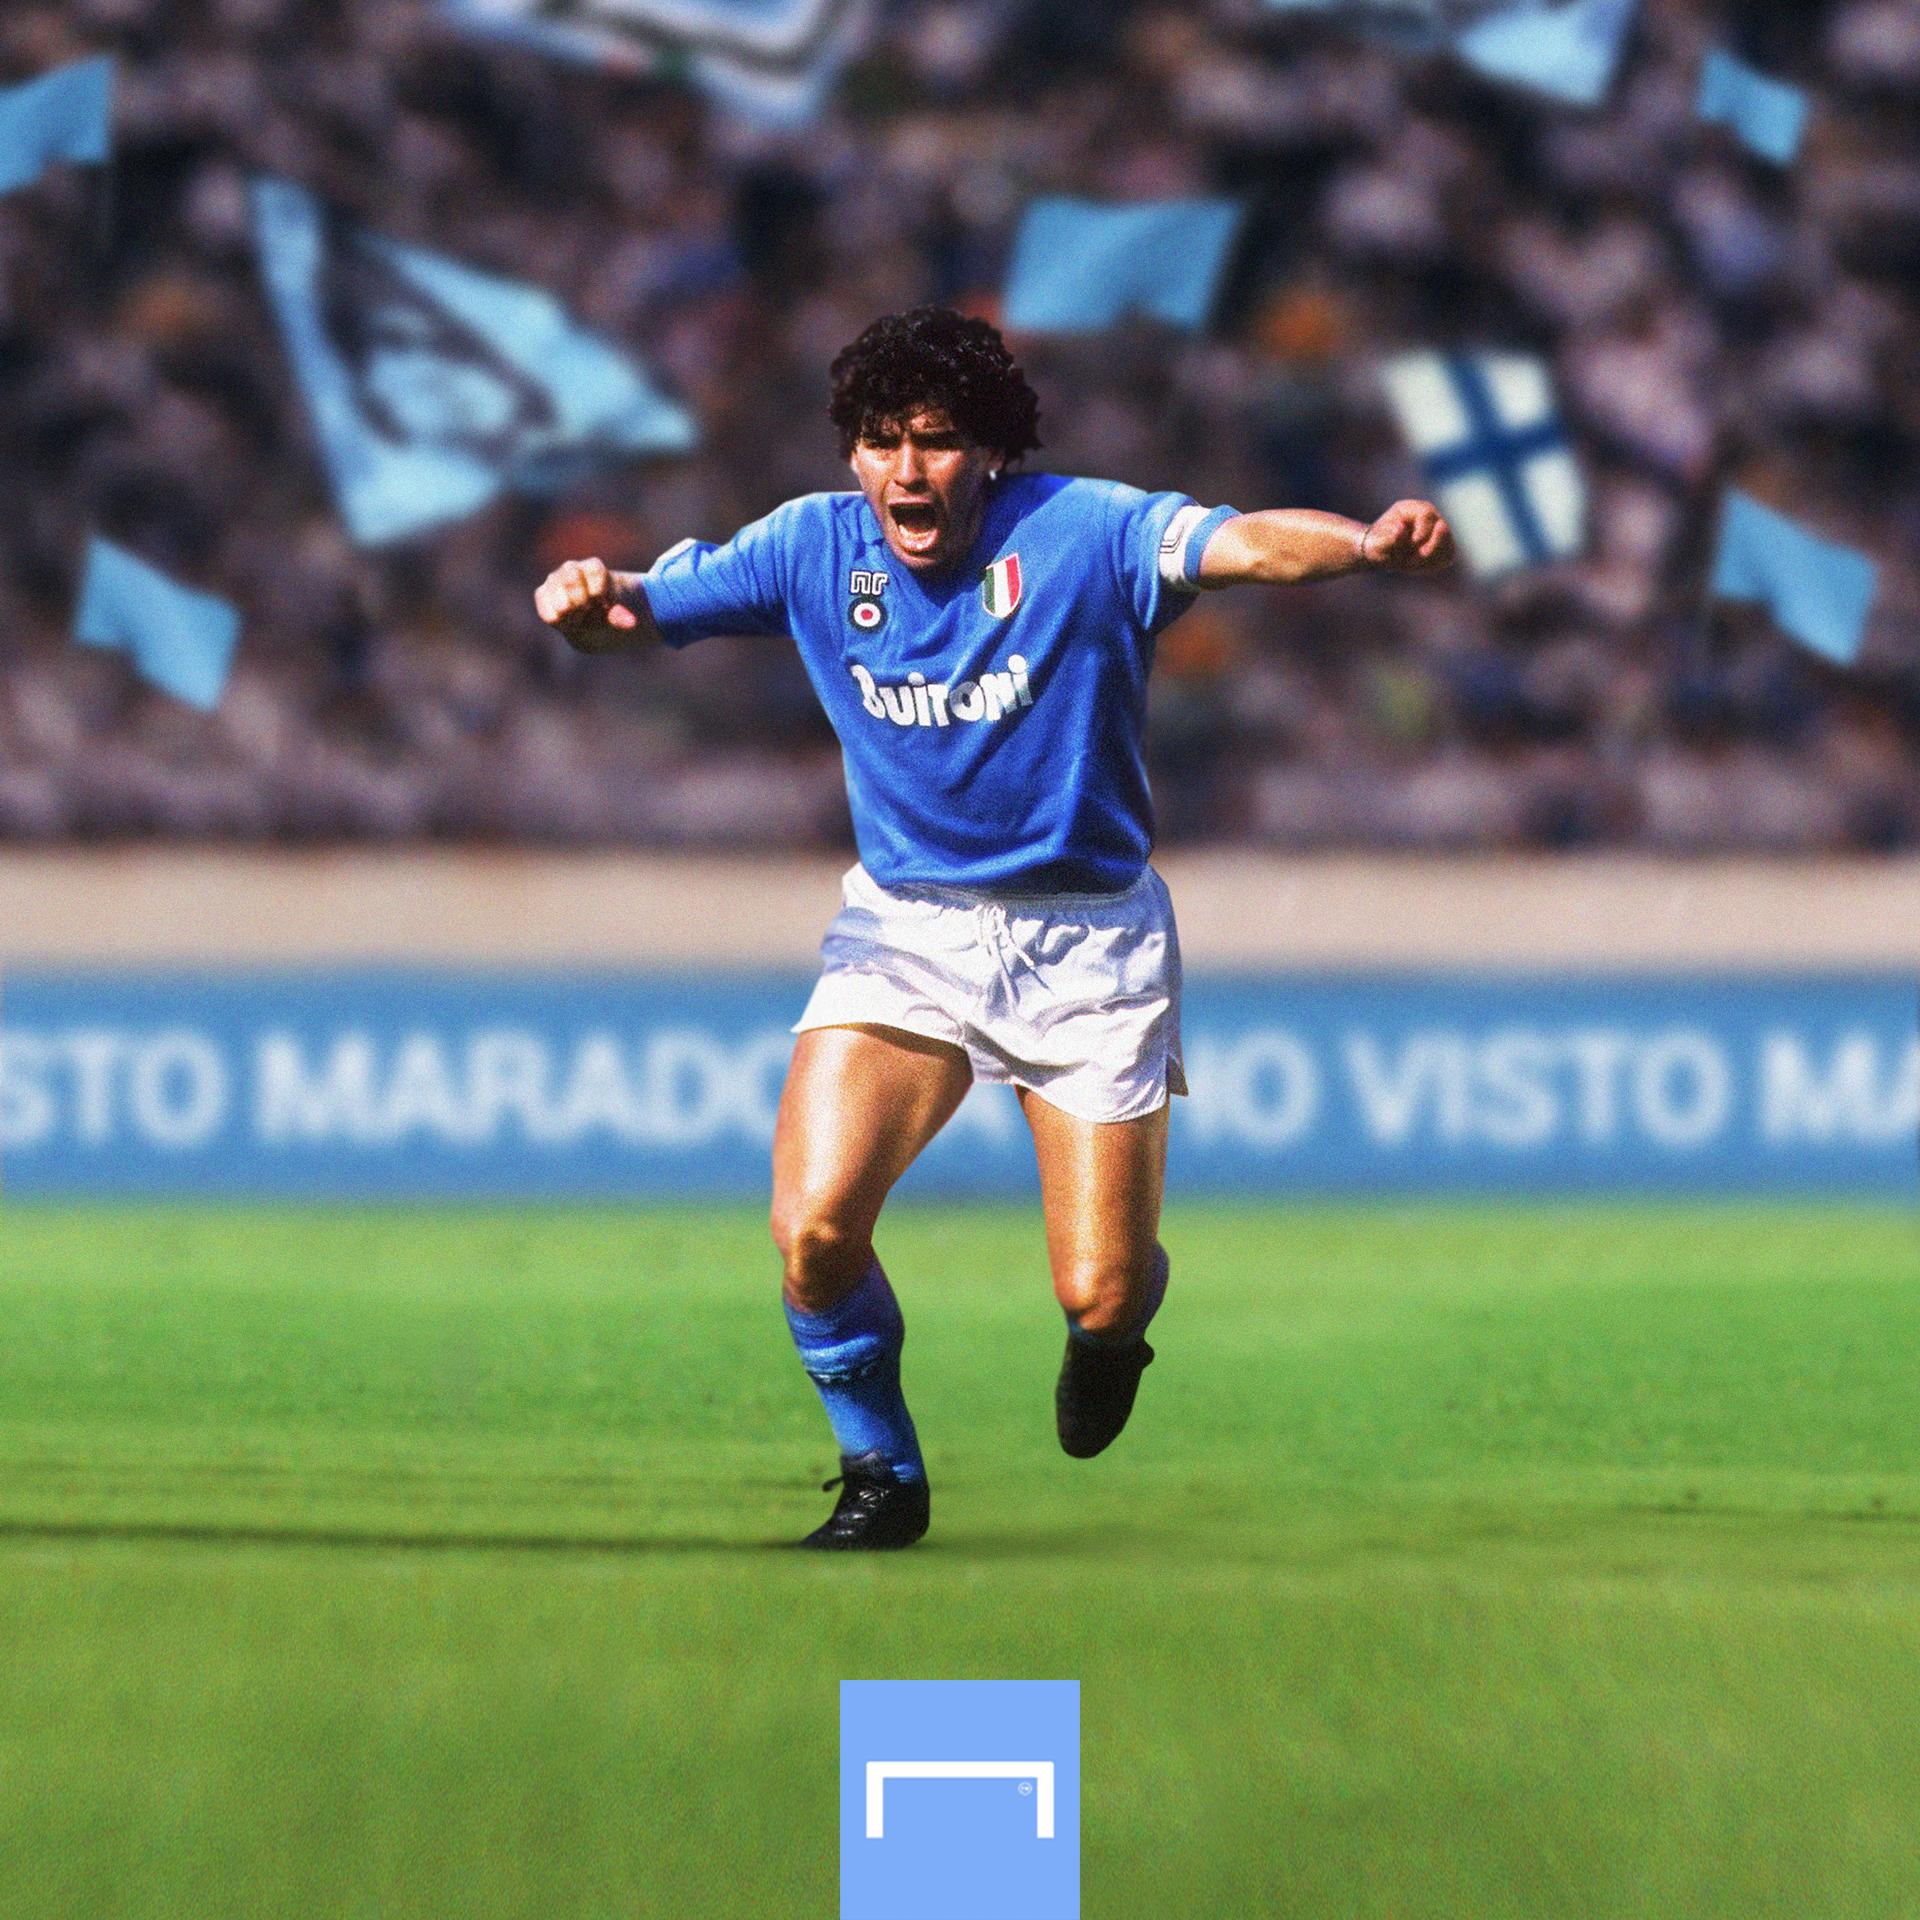 diego-maradona-dead-football-legend-style-rave